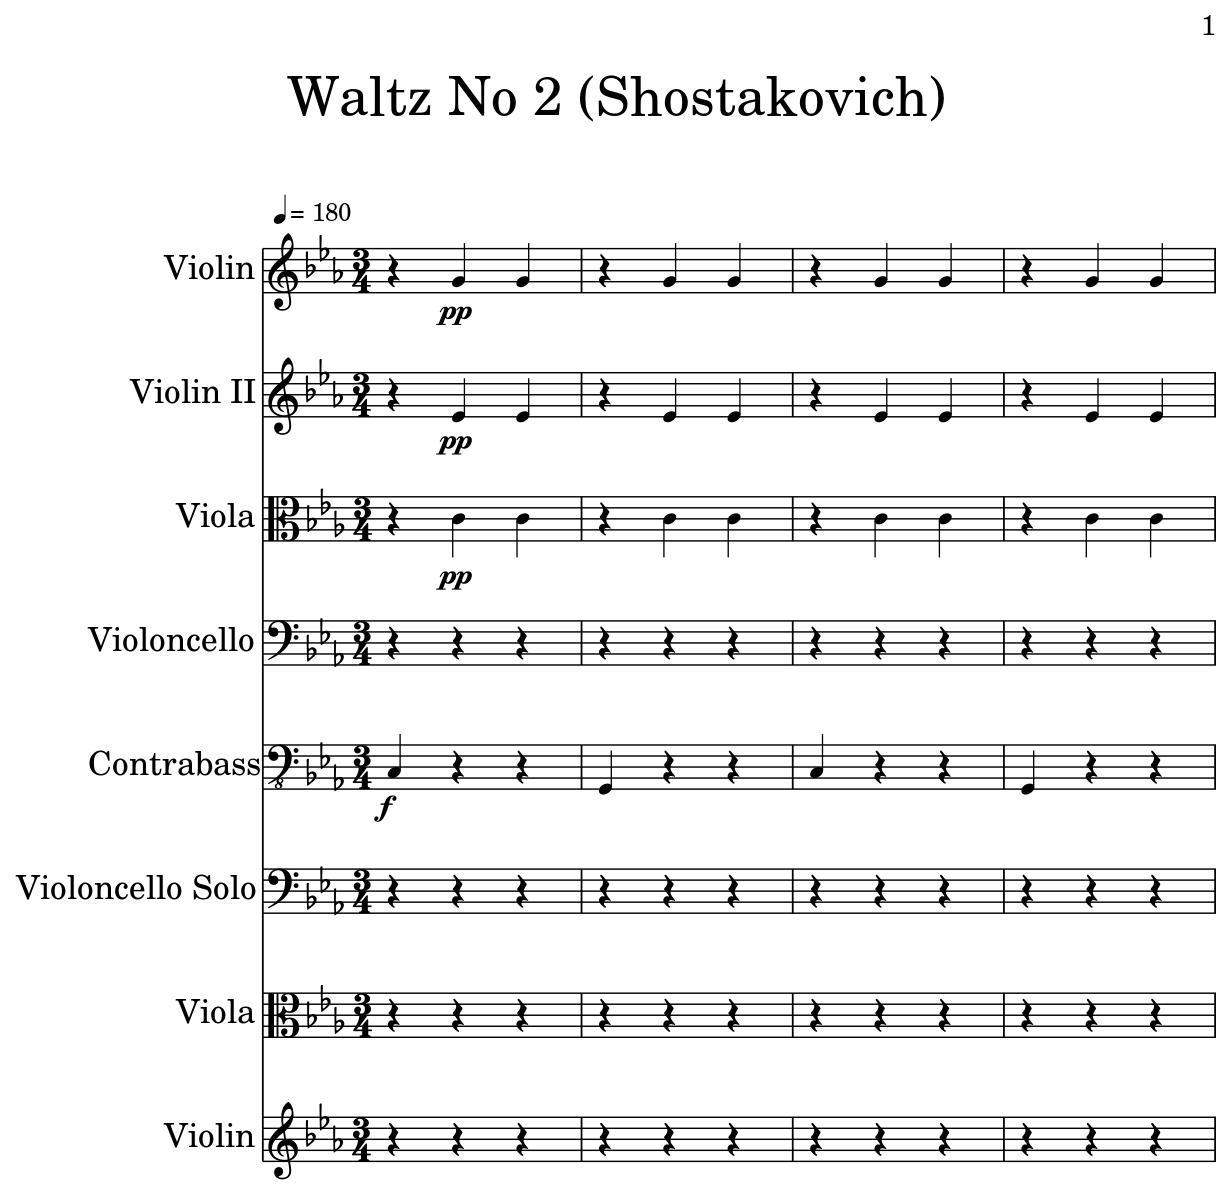 Waltz No 2 (Shostakovich) - Flat